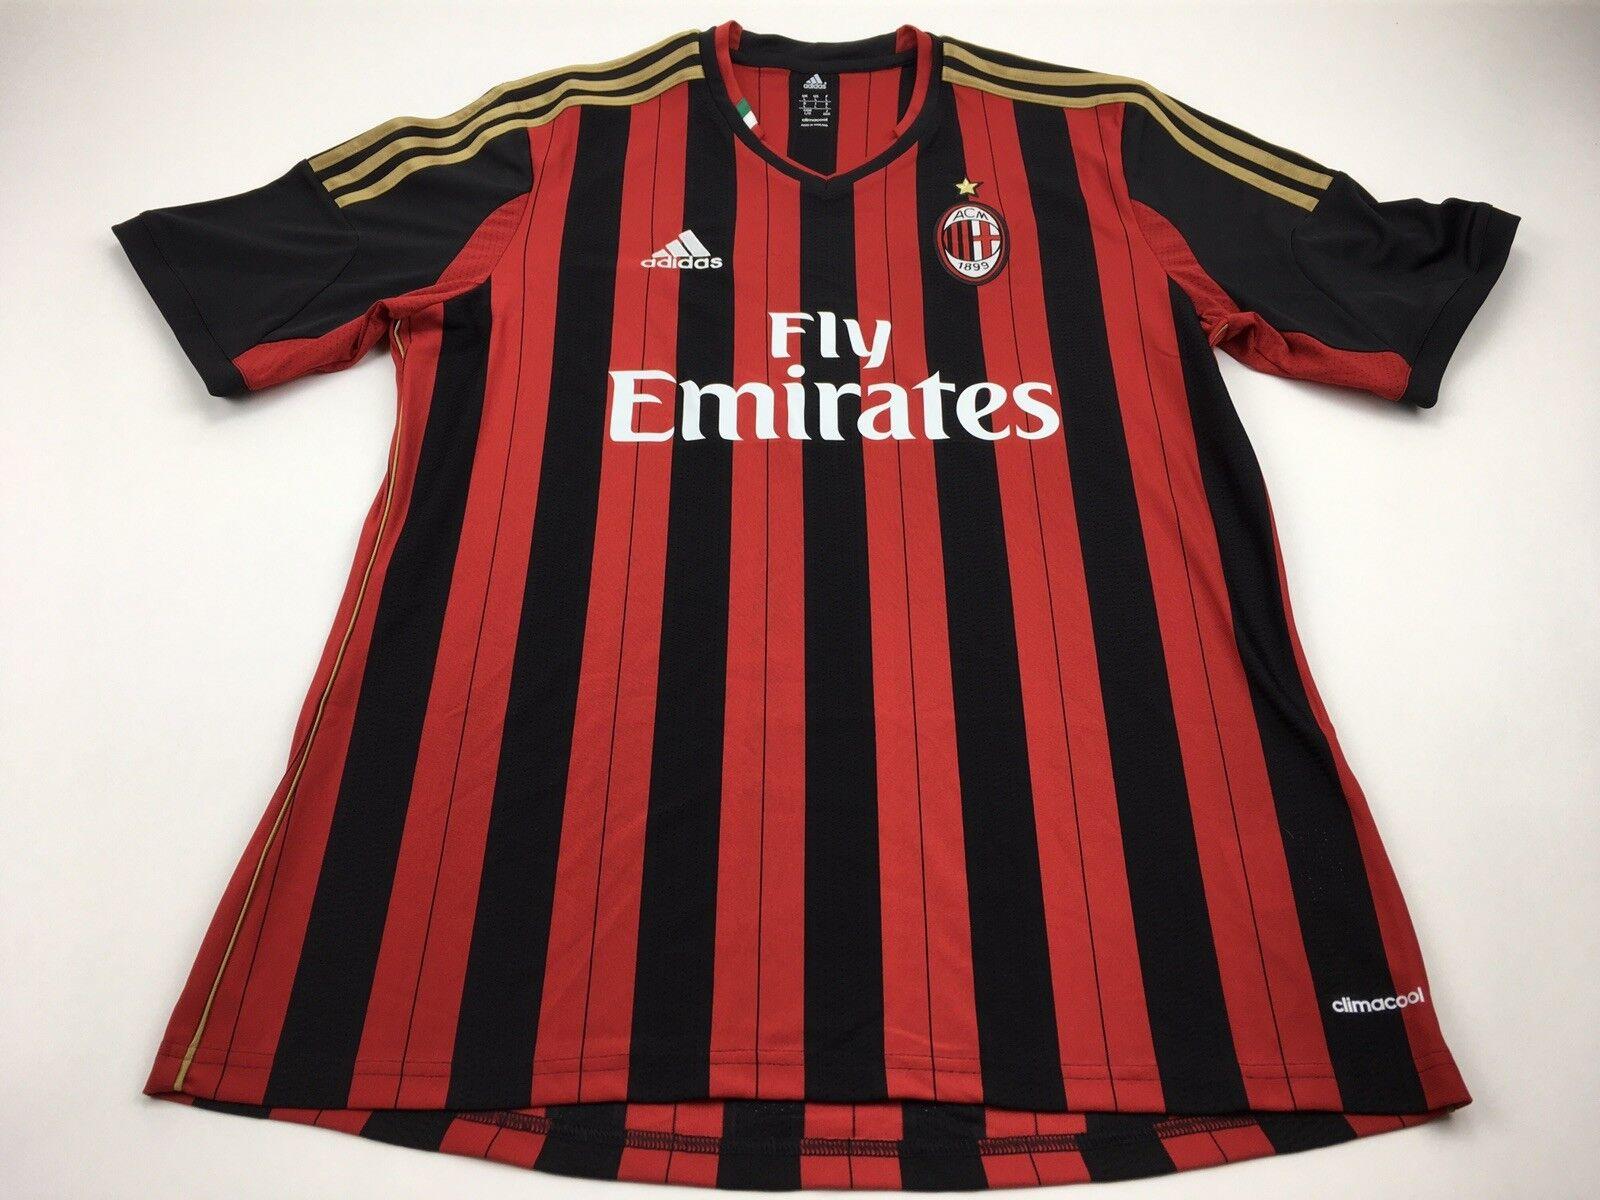 a6caab5d592 AC MILAN Adidas Fly Emirates Soccer ACM ITALY size L jersey Futbol  nsmxum19929-Activewear Tops